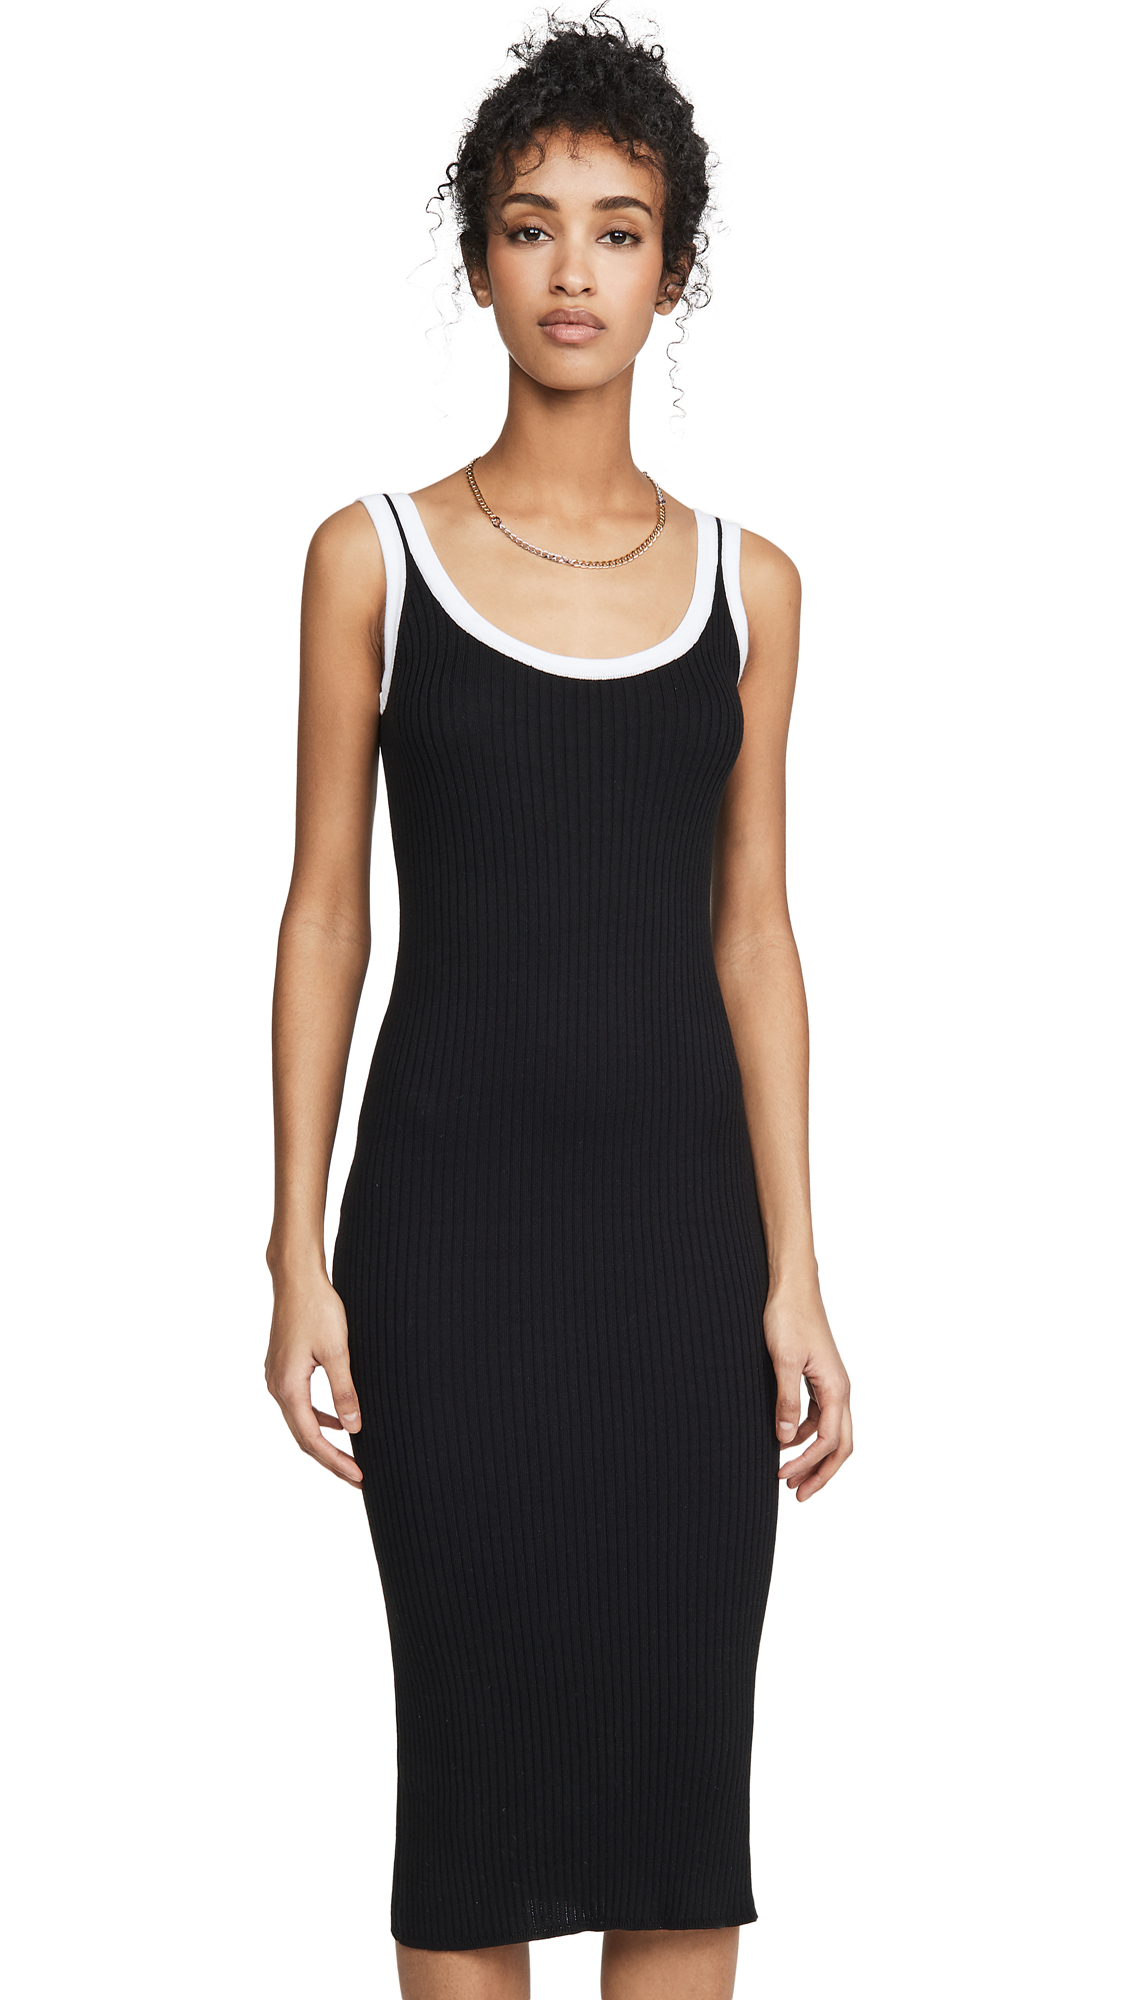 Buy Autumn Cashmere Rib Midi Tank Dress with Porthole Back online beautiful Autumn Cashmere Clothing, Dresses